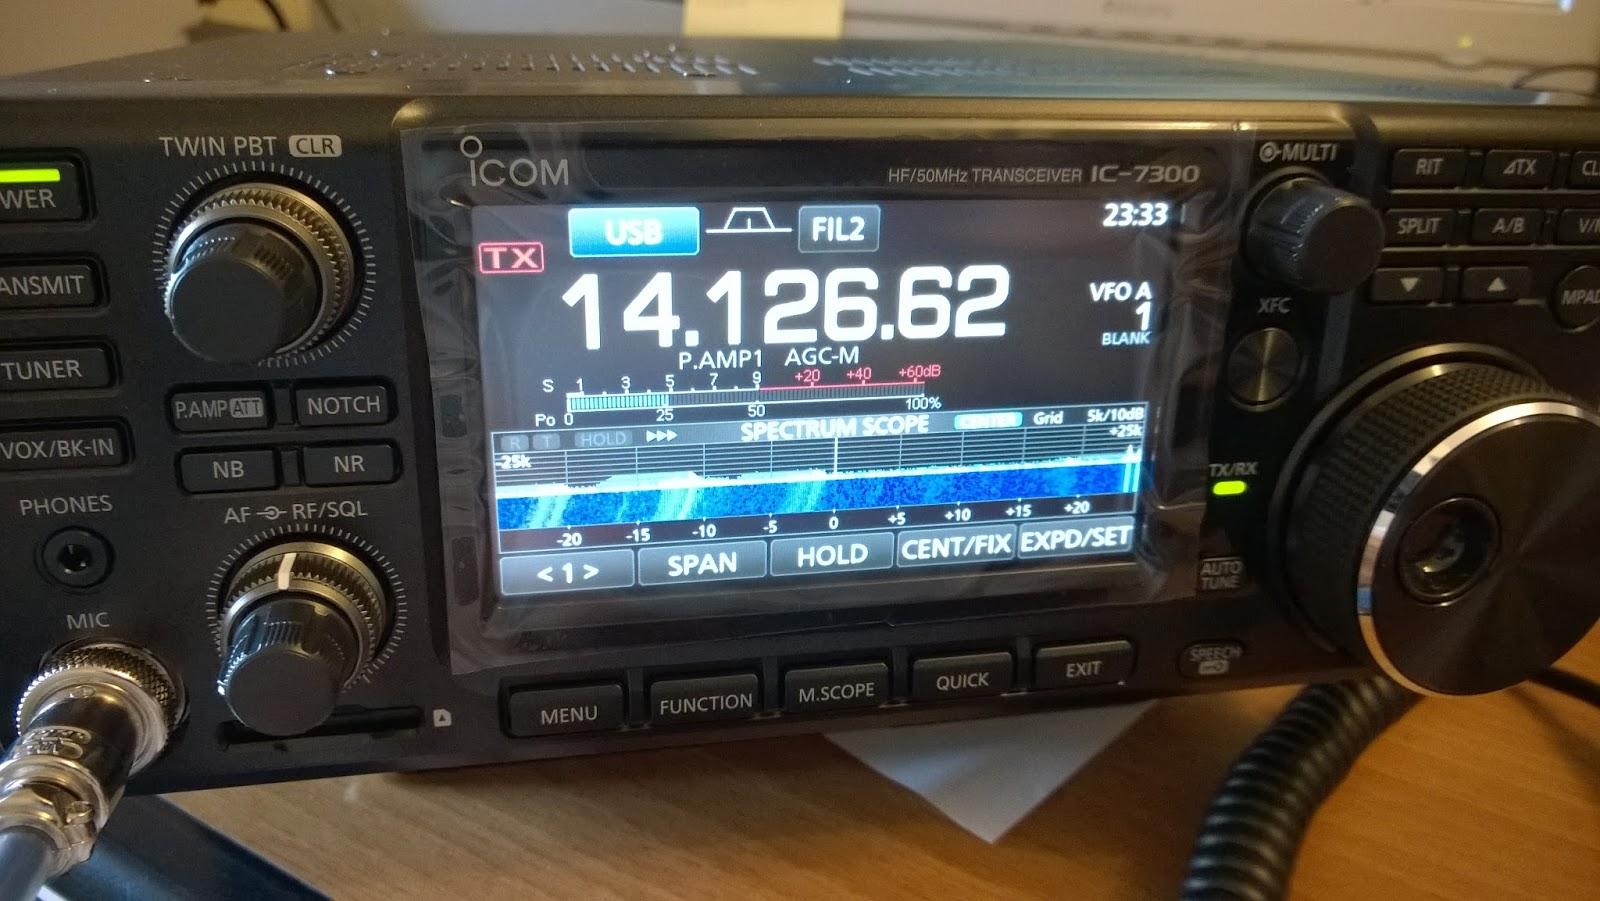 Yo3hjv Aprilie 2016 Vk6wia News Broadcast Transceiver Circuits Nota Transceiverul Testat Este Versiunea Europeana Care Include Si 70 Mhz